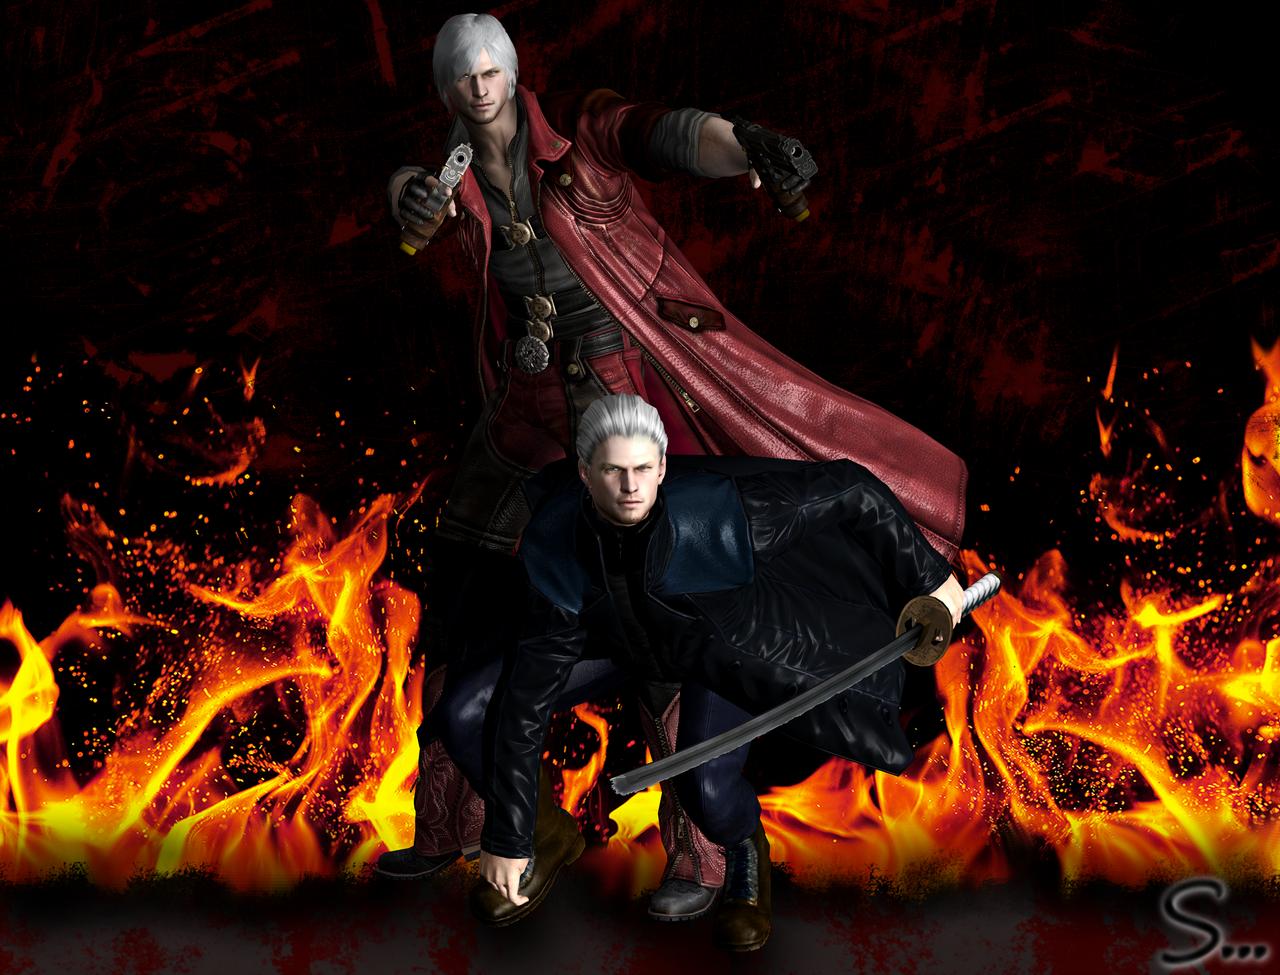 Dante and Vergil DMC 4 by DMC-fan-DMC